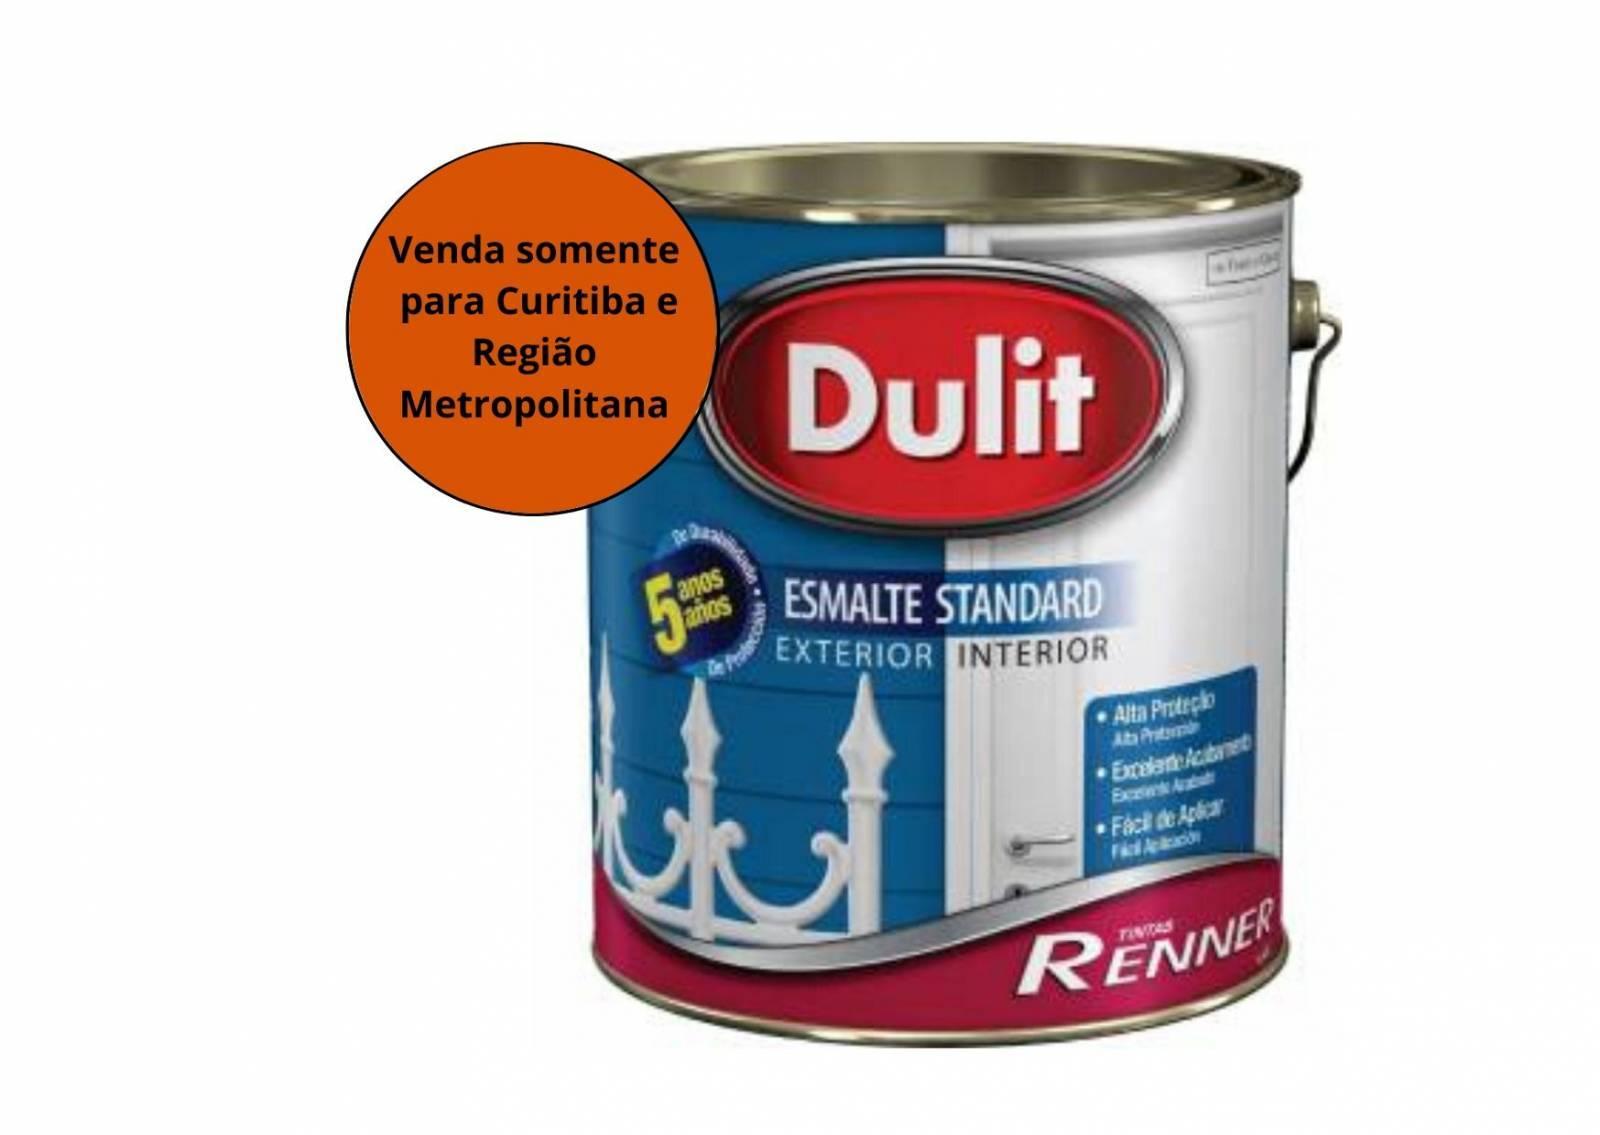 Tinta Esmalte Dulit Branco Brilhante 3,6L Renner - MATERGI MATERIAIS DE CONSTRUÇÃO